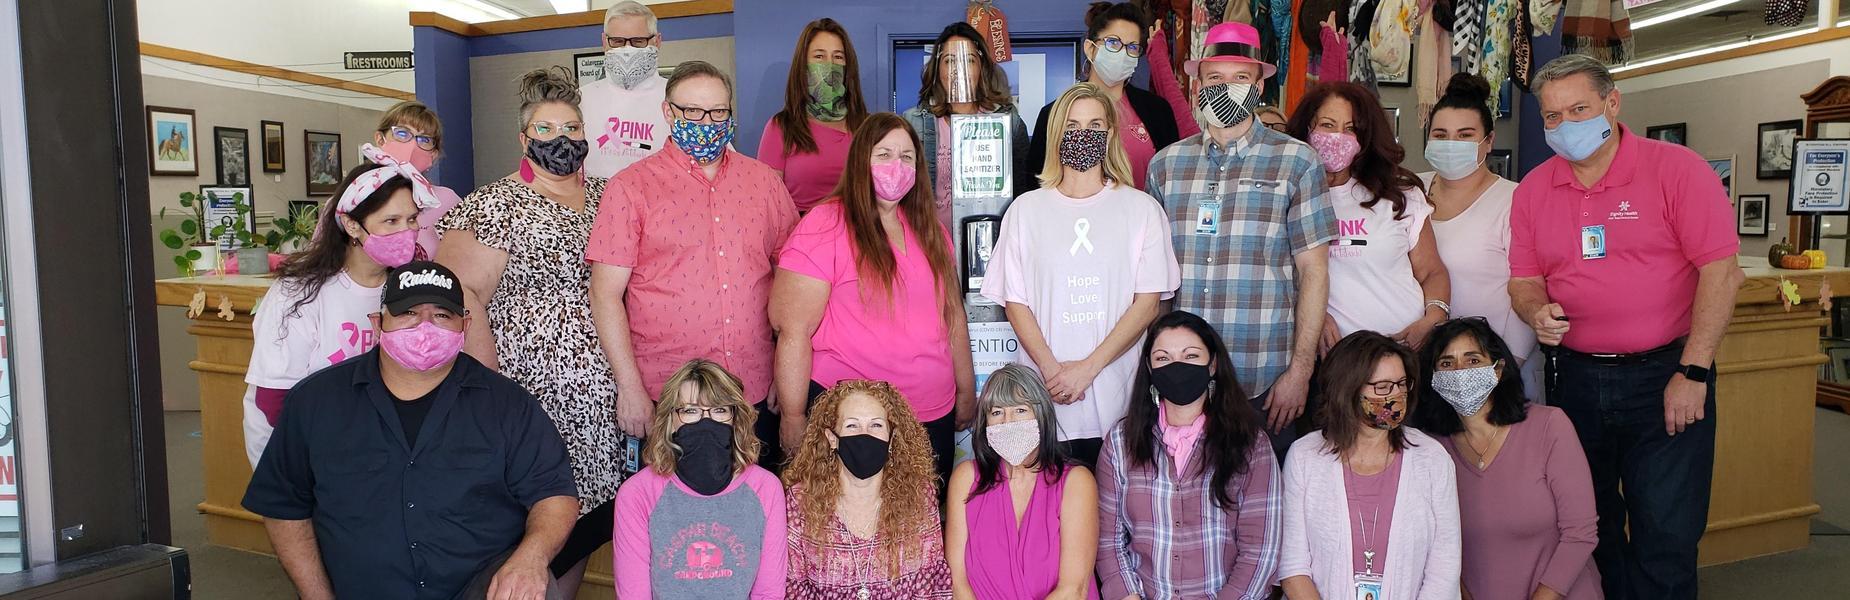 CCOE employees wearing pink